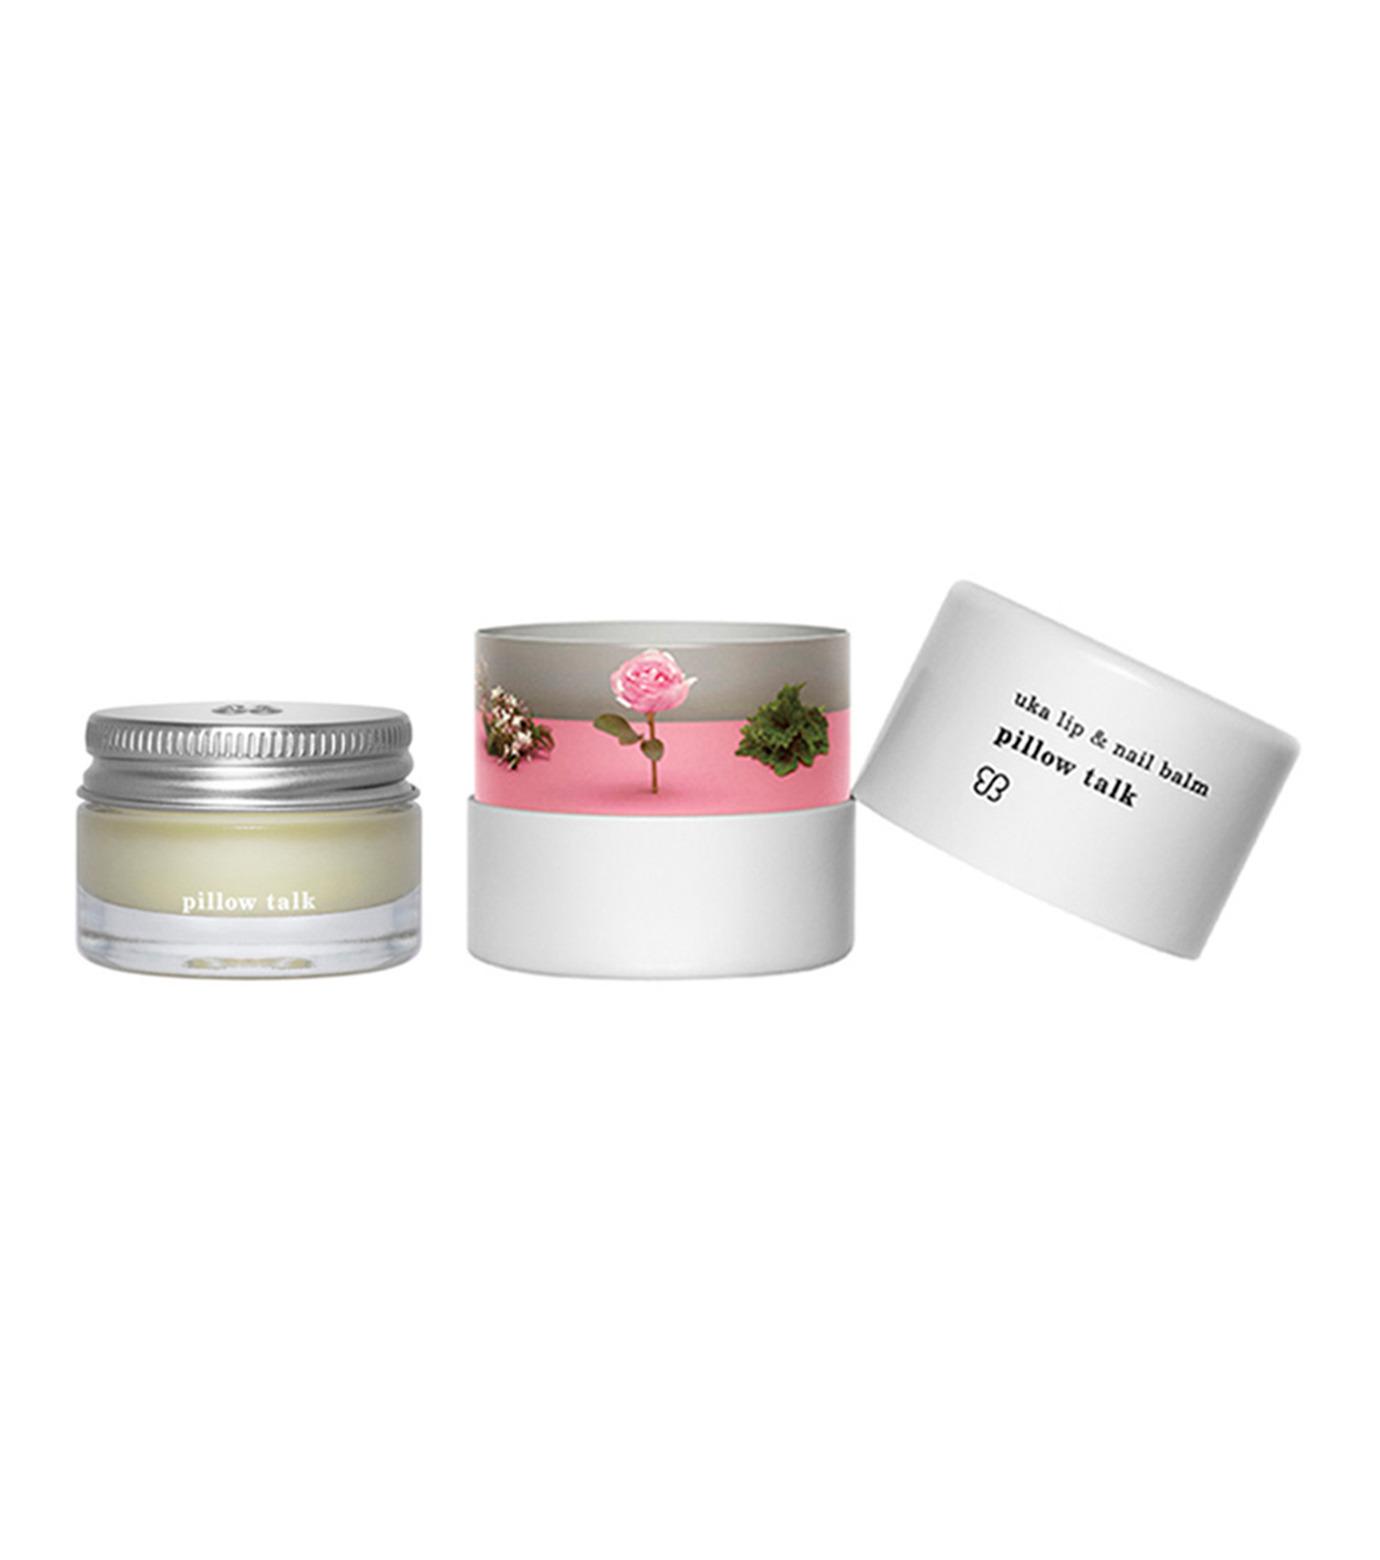 uka(ウカ)のuka lip & nail balm pillow talk-WHITE(コスメティックス/cosmetics)-3000021-4 拡大詳細画像1